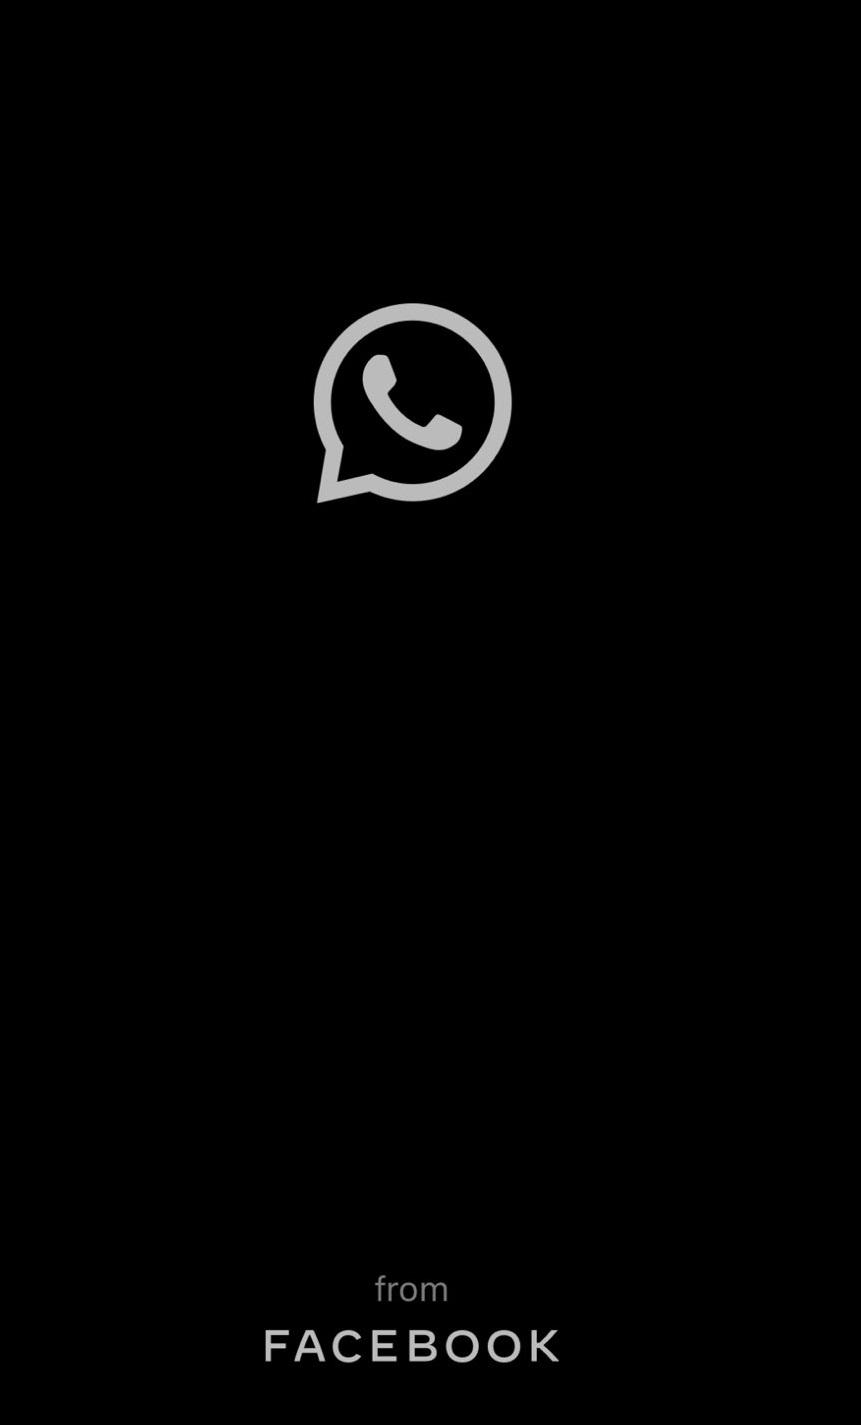 How to activate WhatsApp dark mode